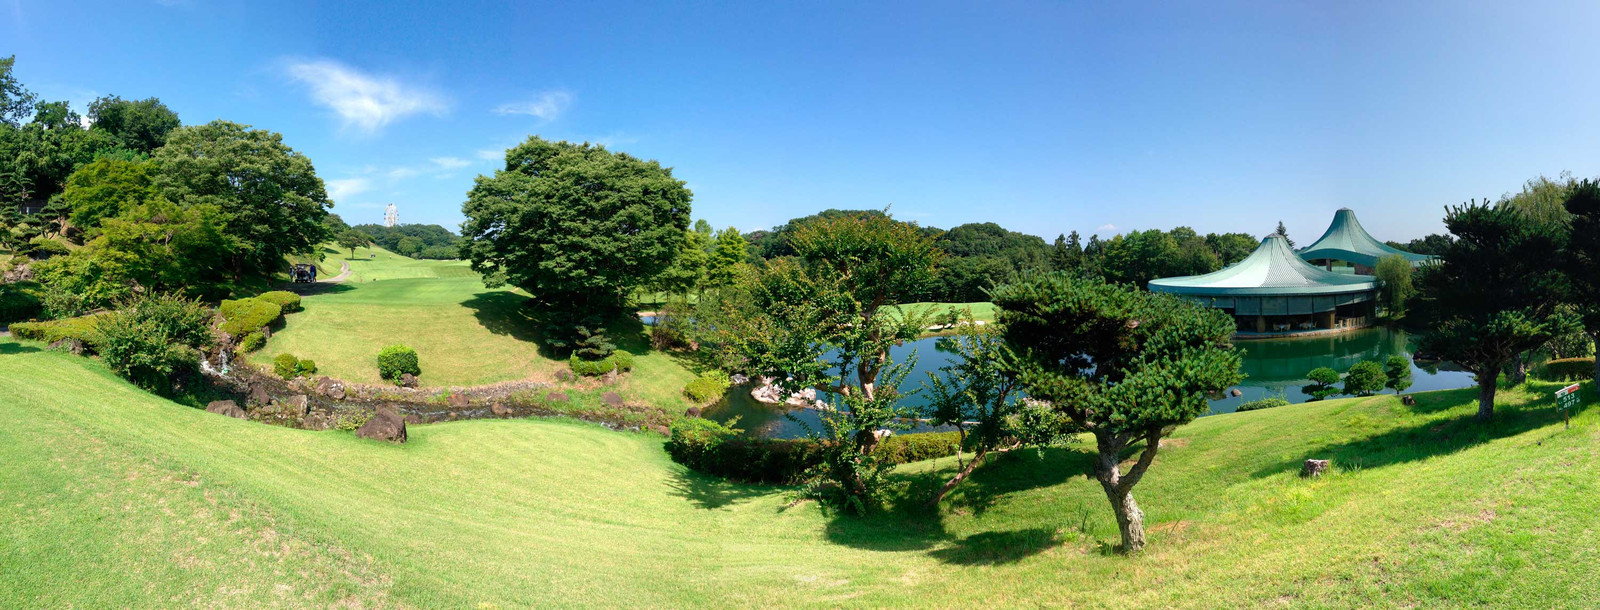 20140712_golf